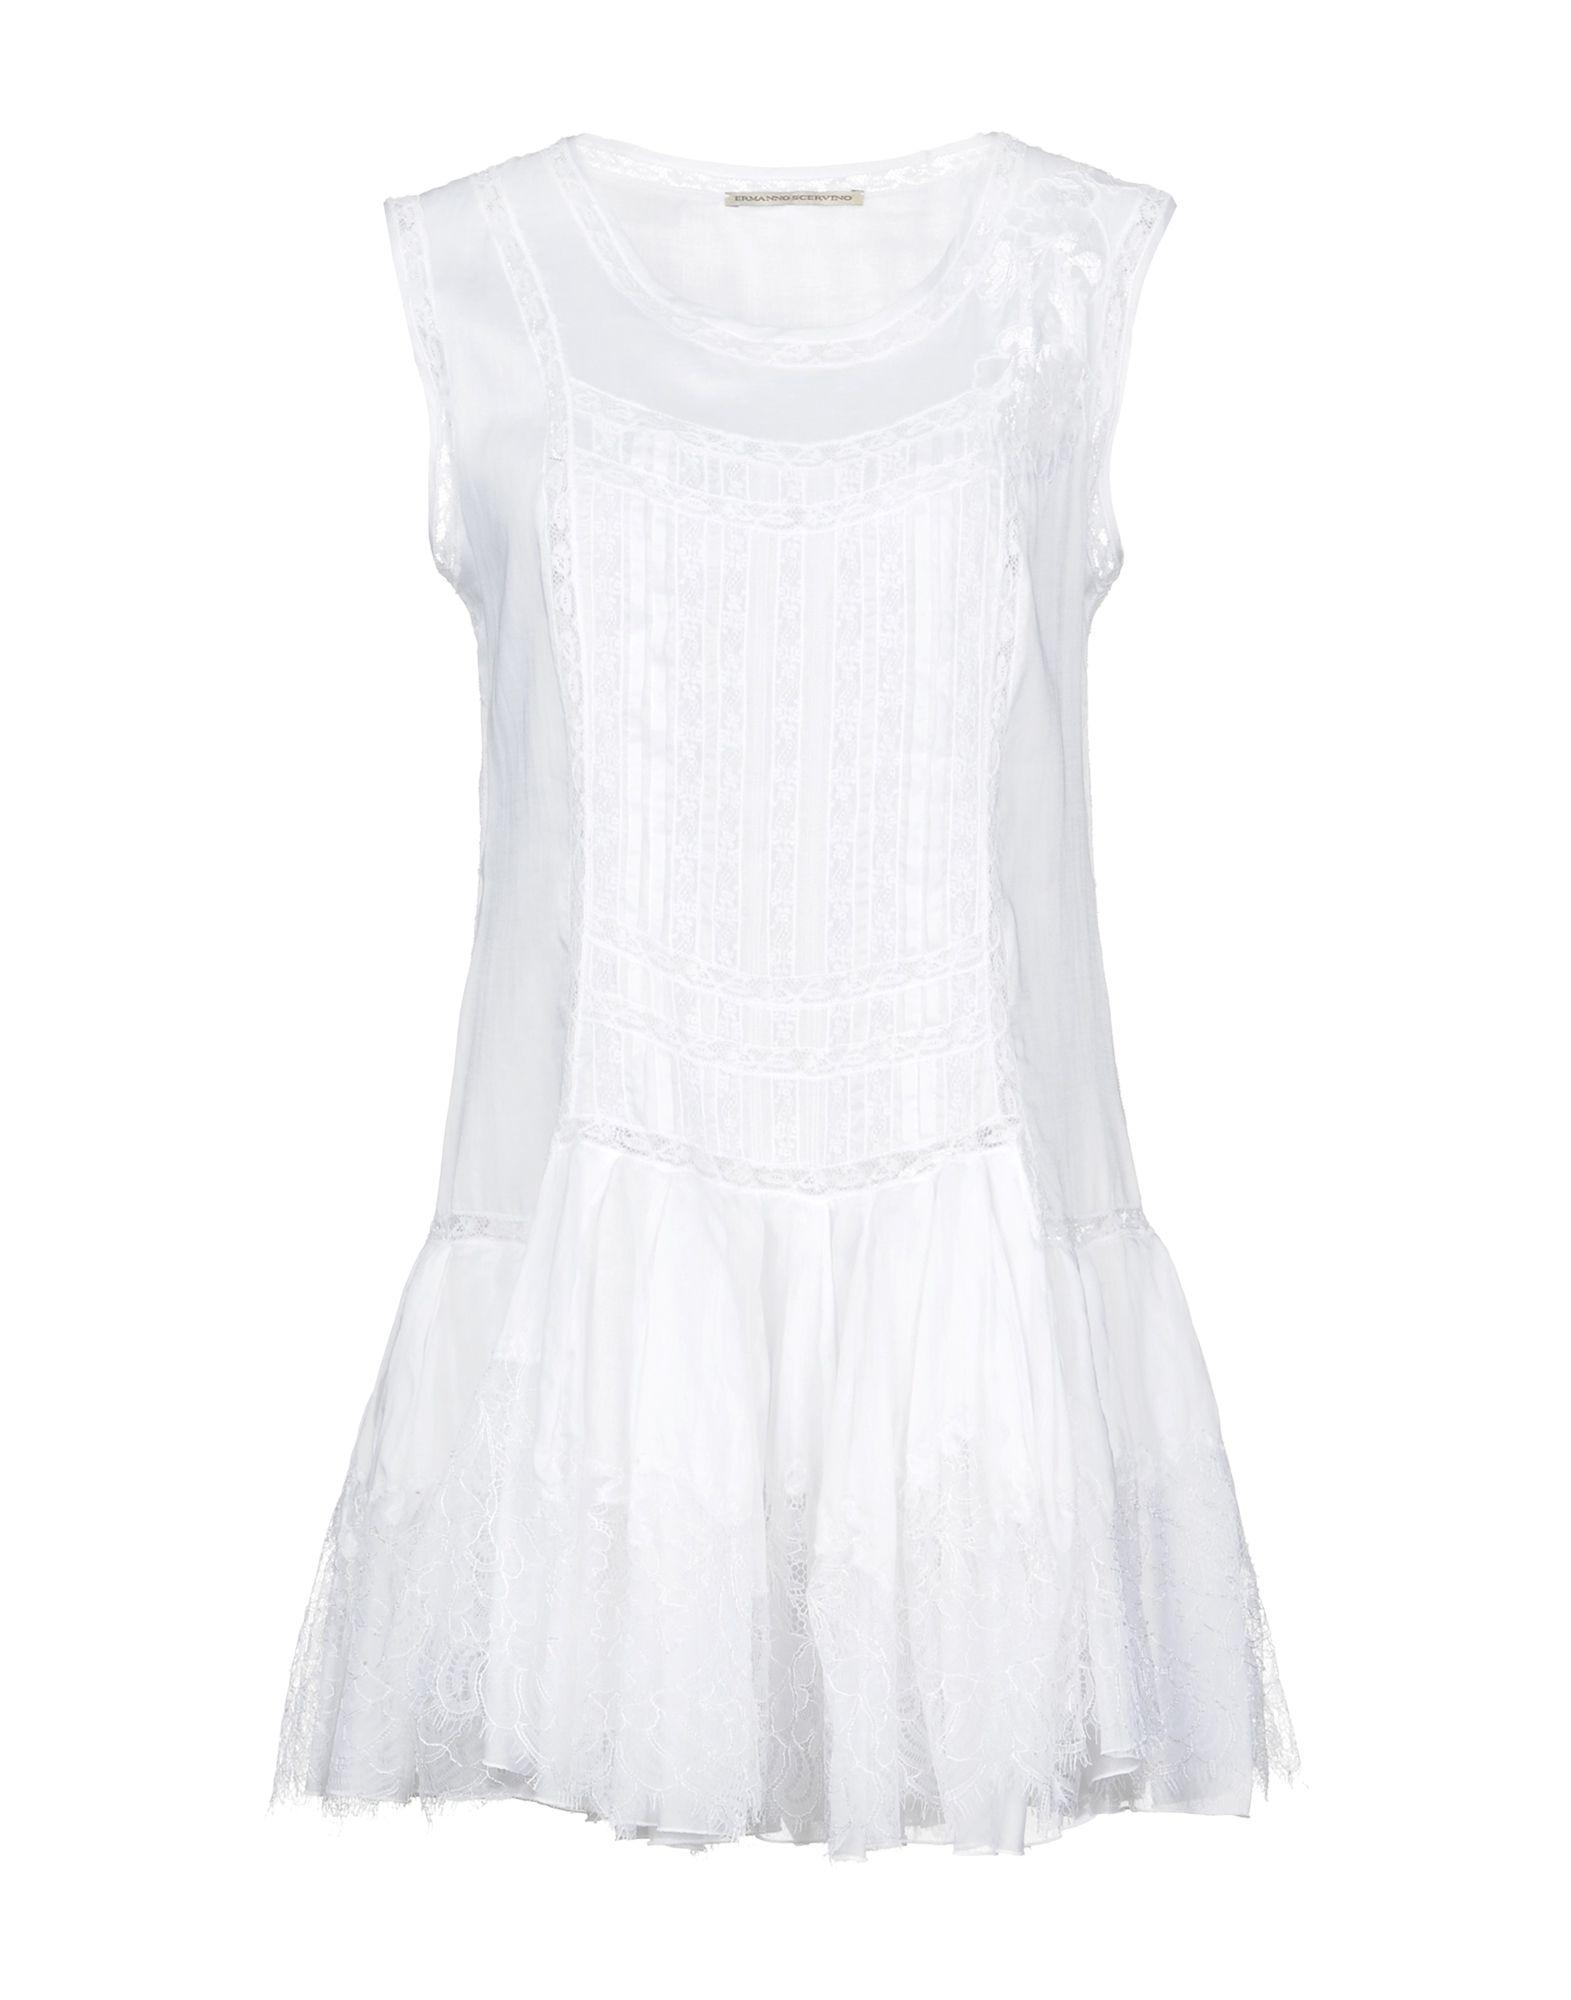 Ermanno Scervino Short Dress In White